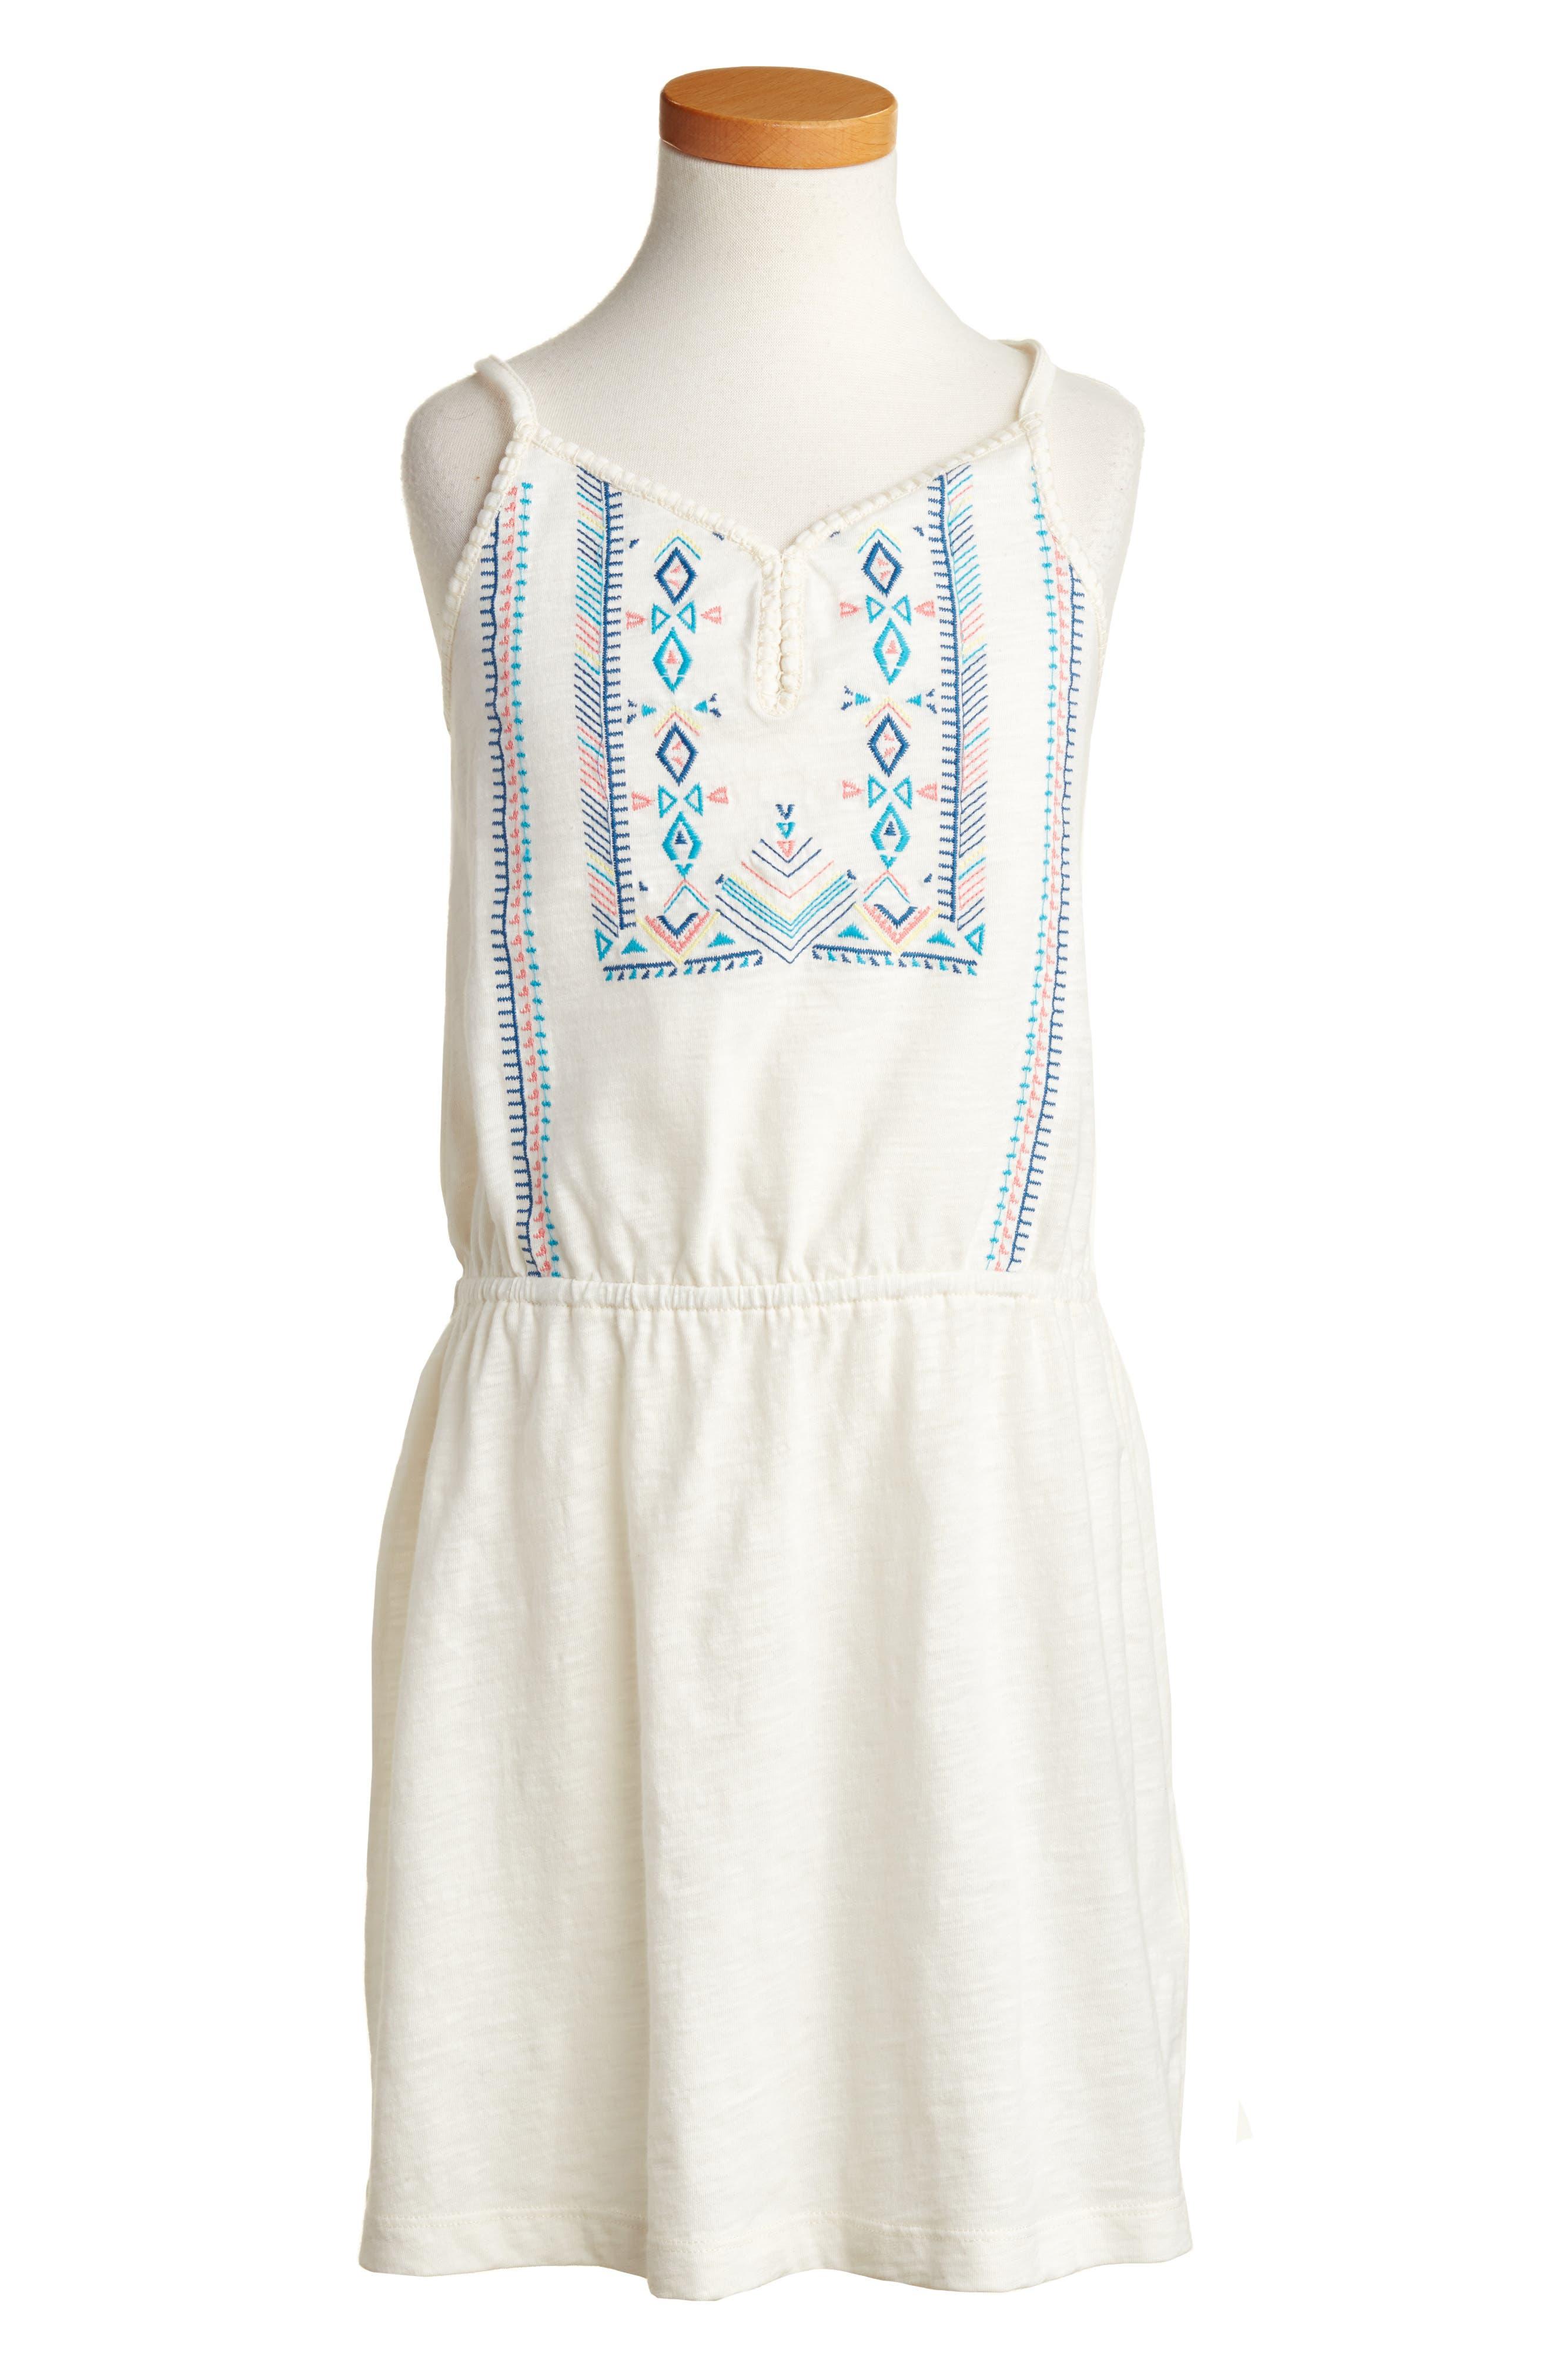 Roxy Nice Cream Embroidered Dress (Big Girls)